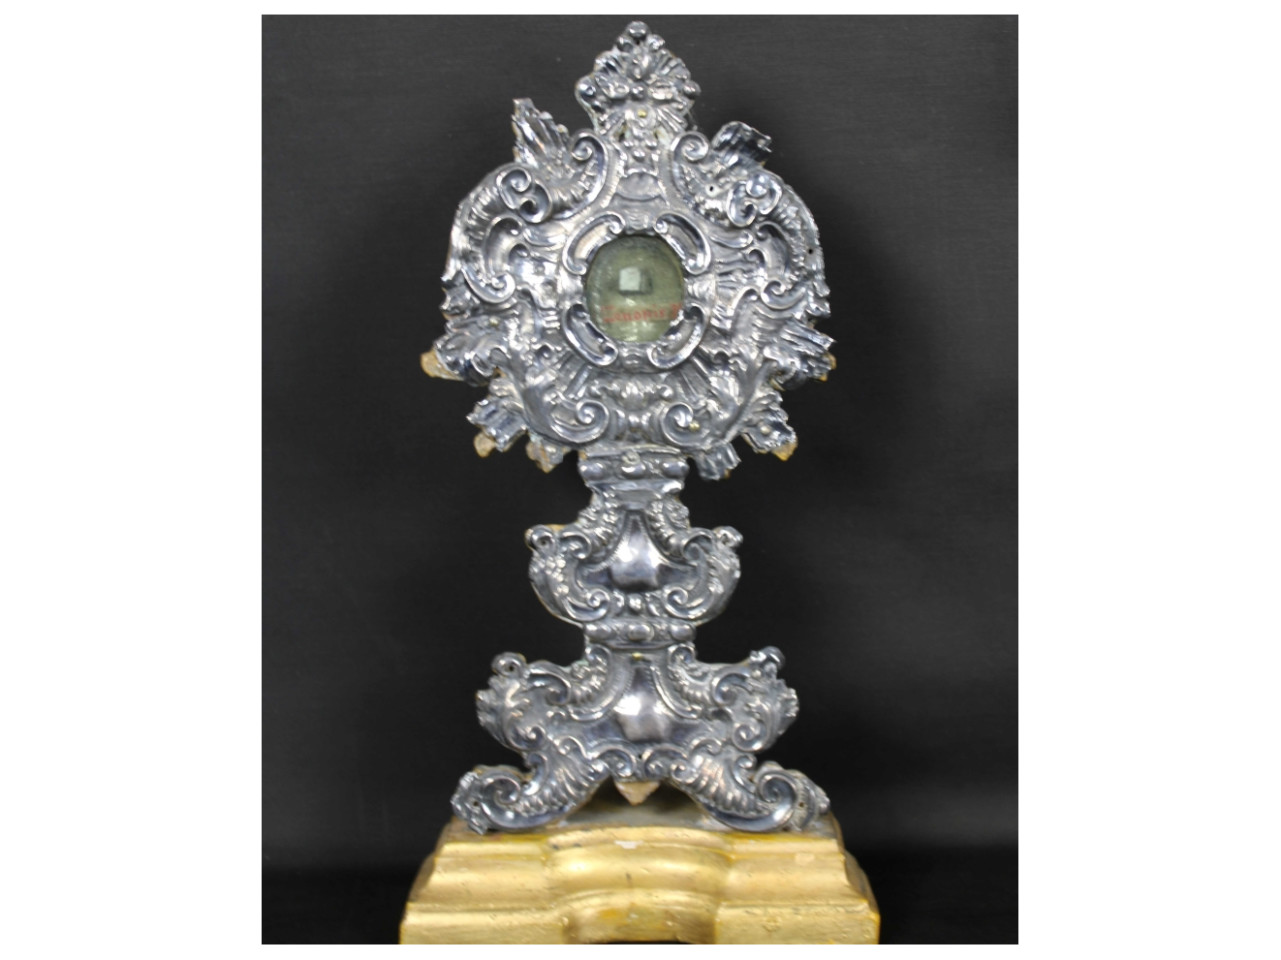 Reliquiario in argento -Antichità Ioviero